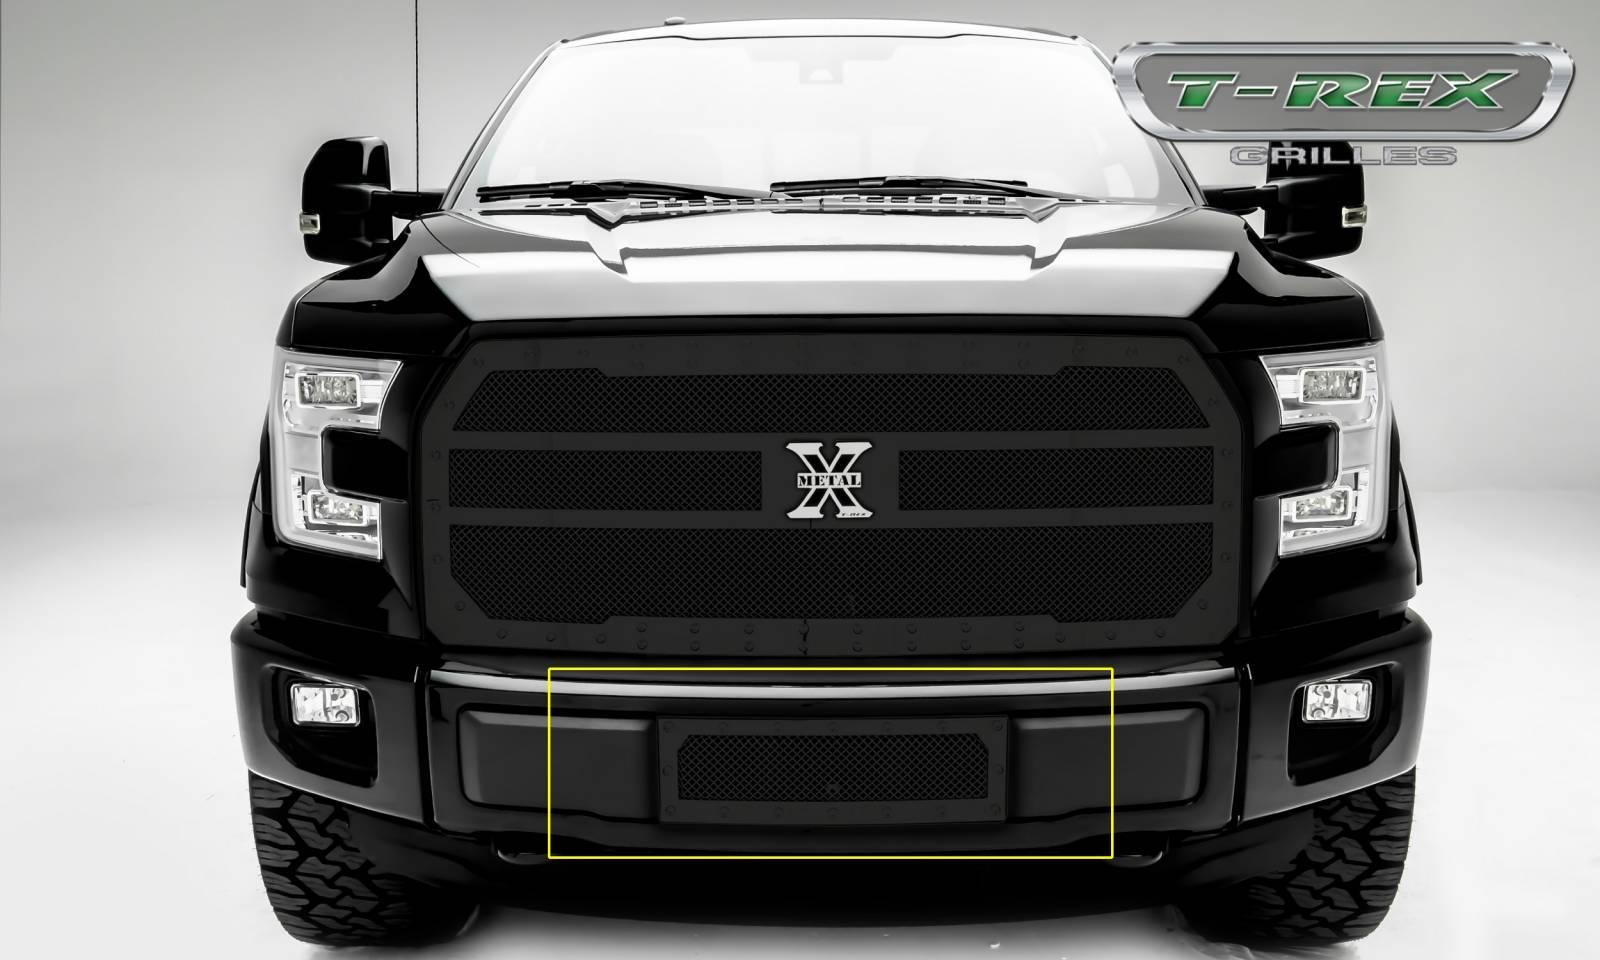 Ford f150 x metal v8 bumper grille